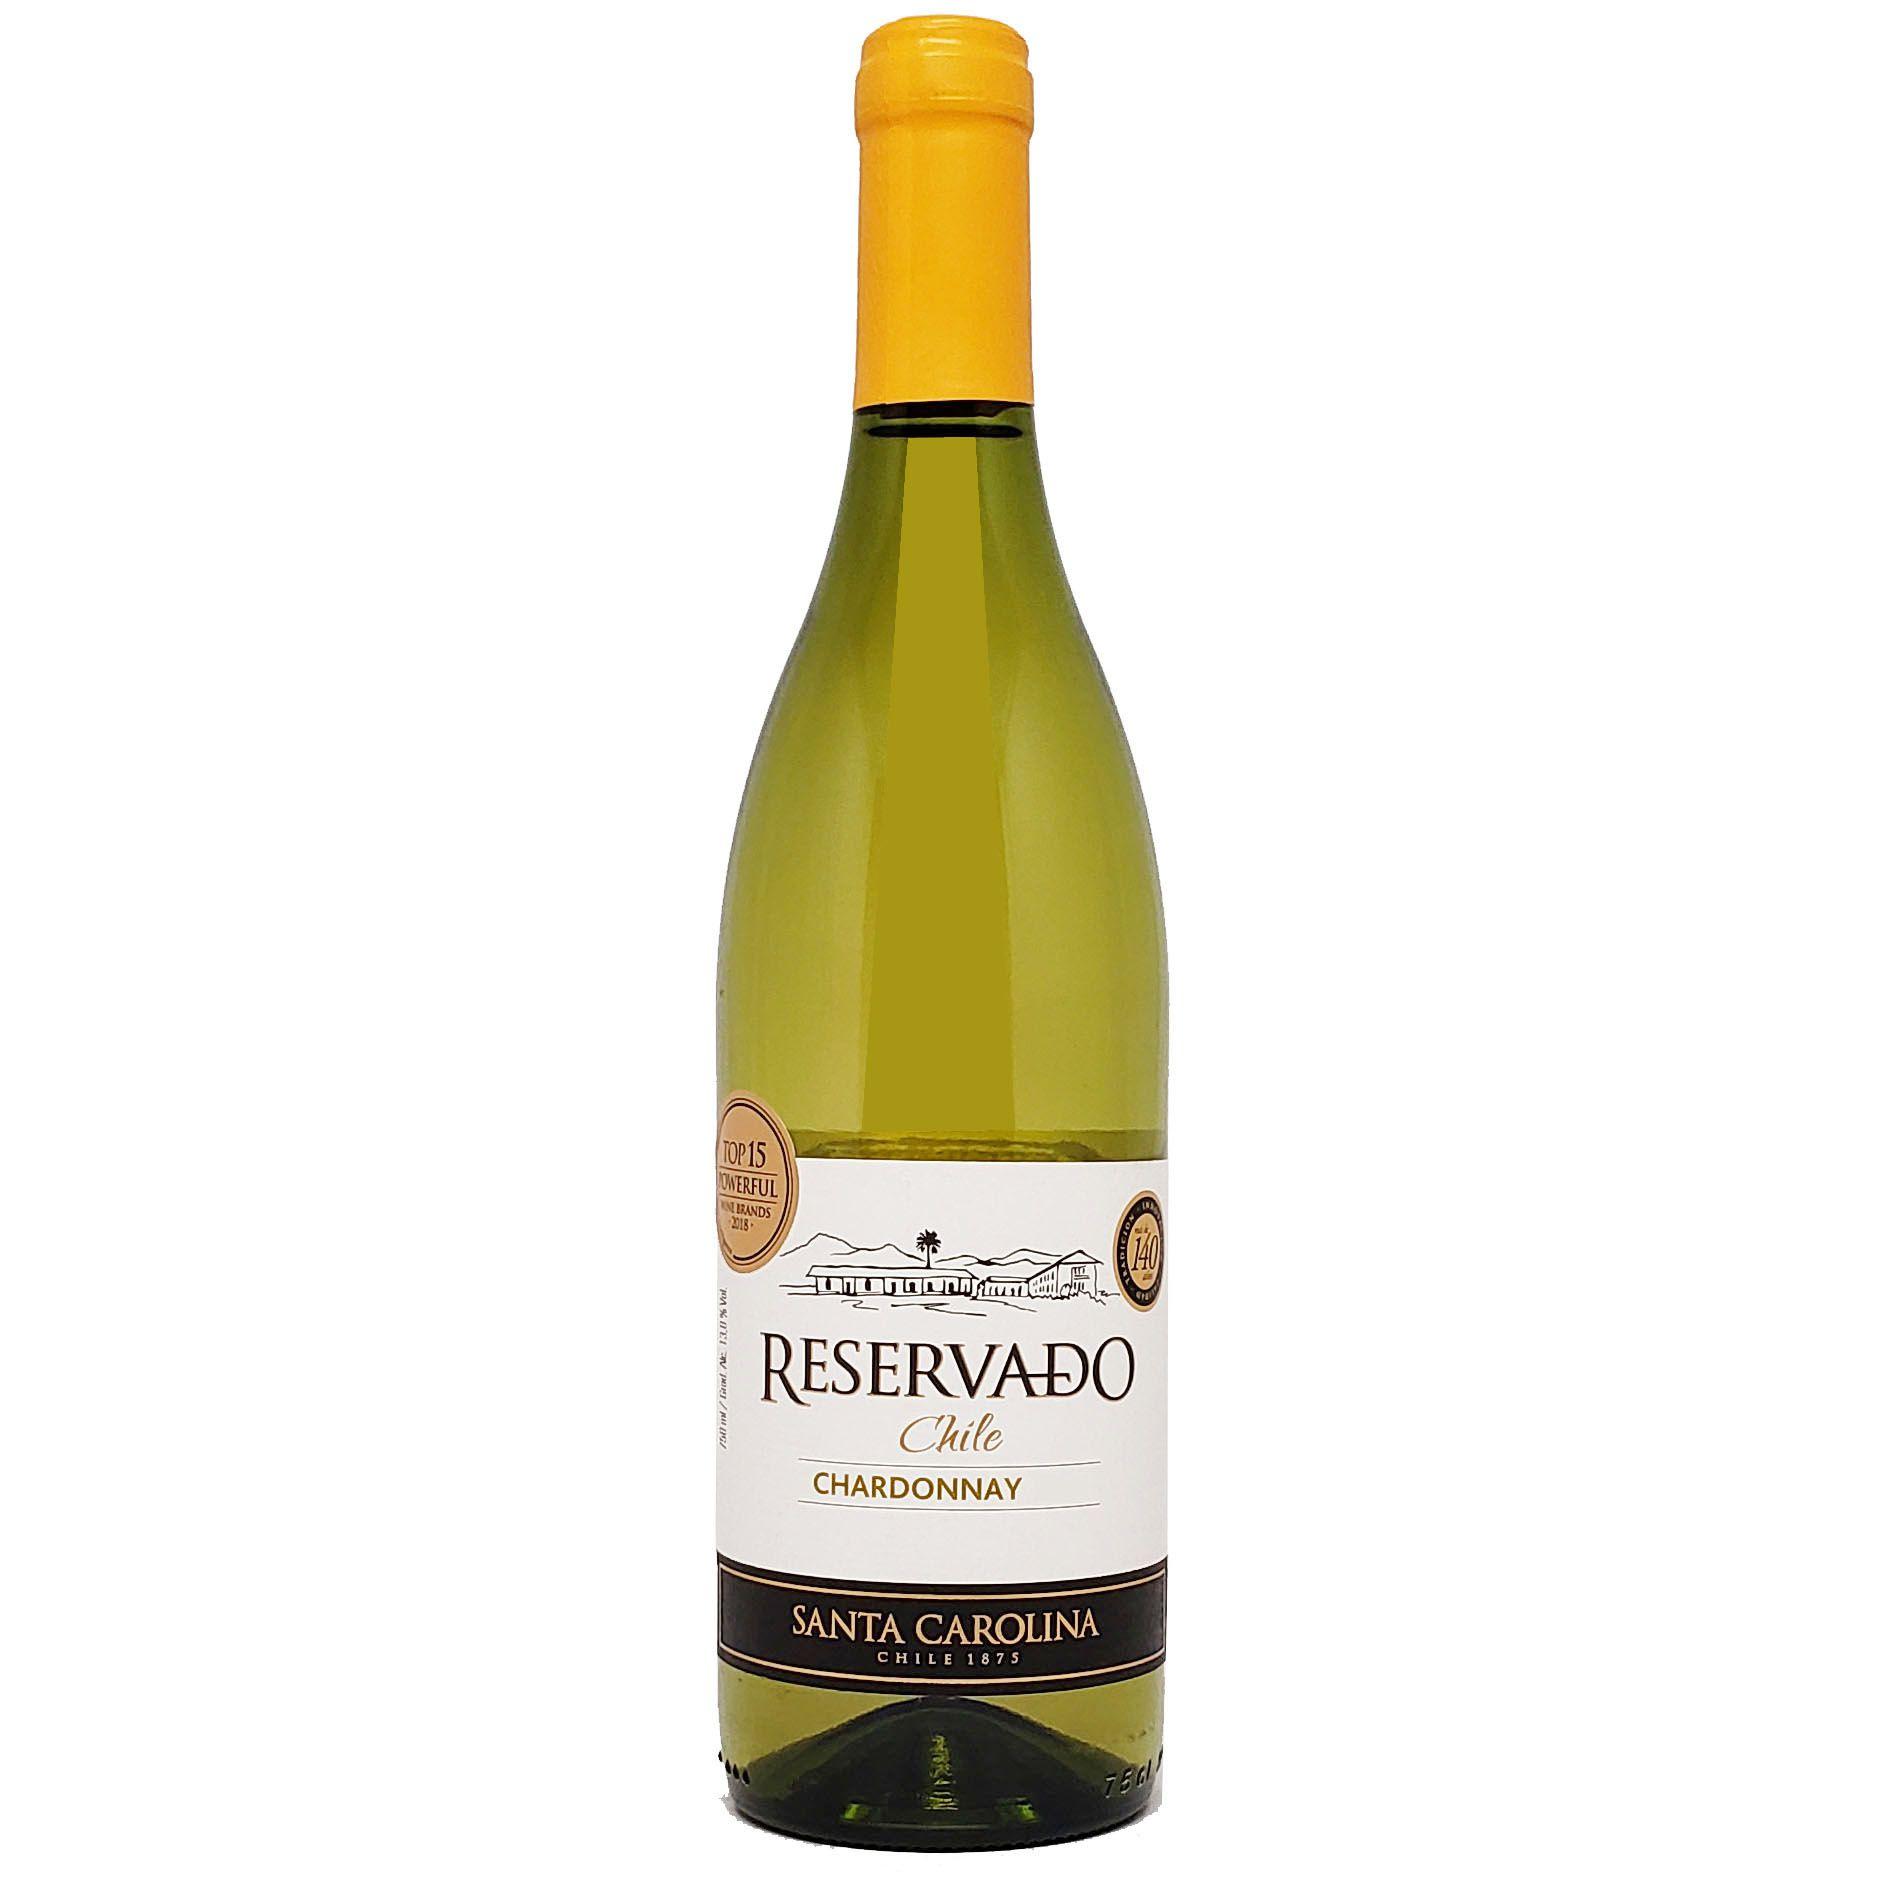 Vinho Branco Santa Carolina Reservado Chardonnay - 750ml -